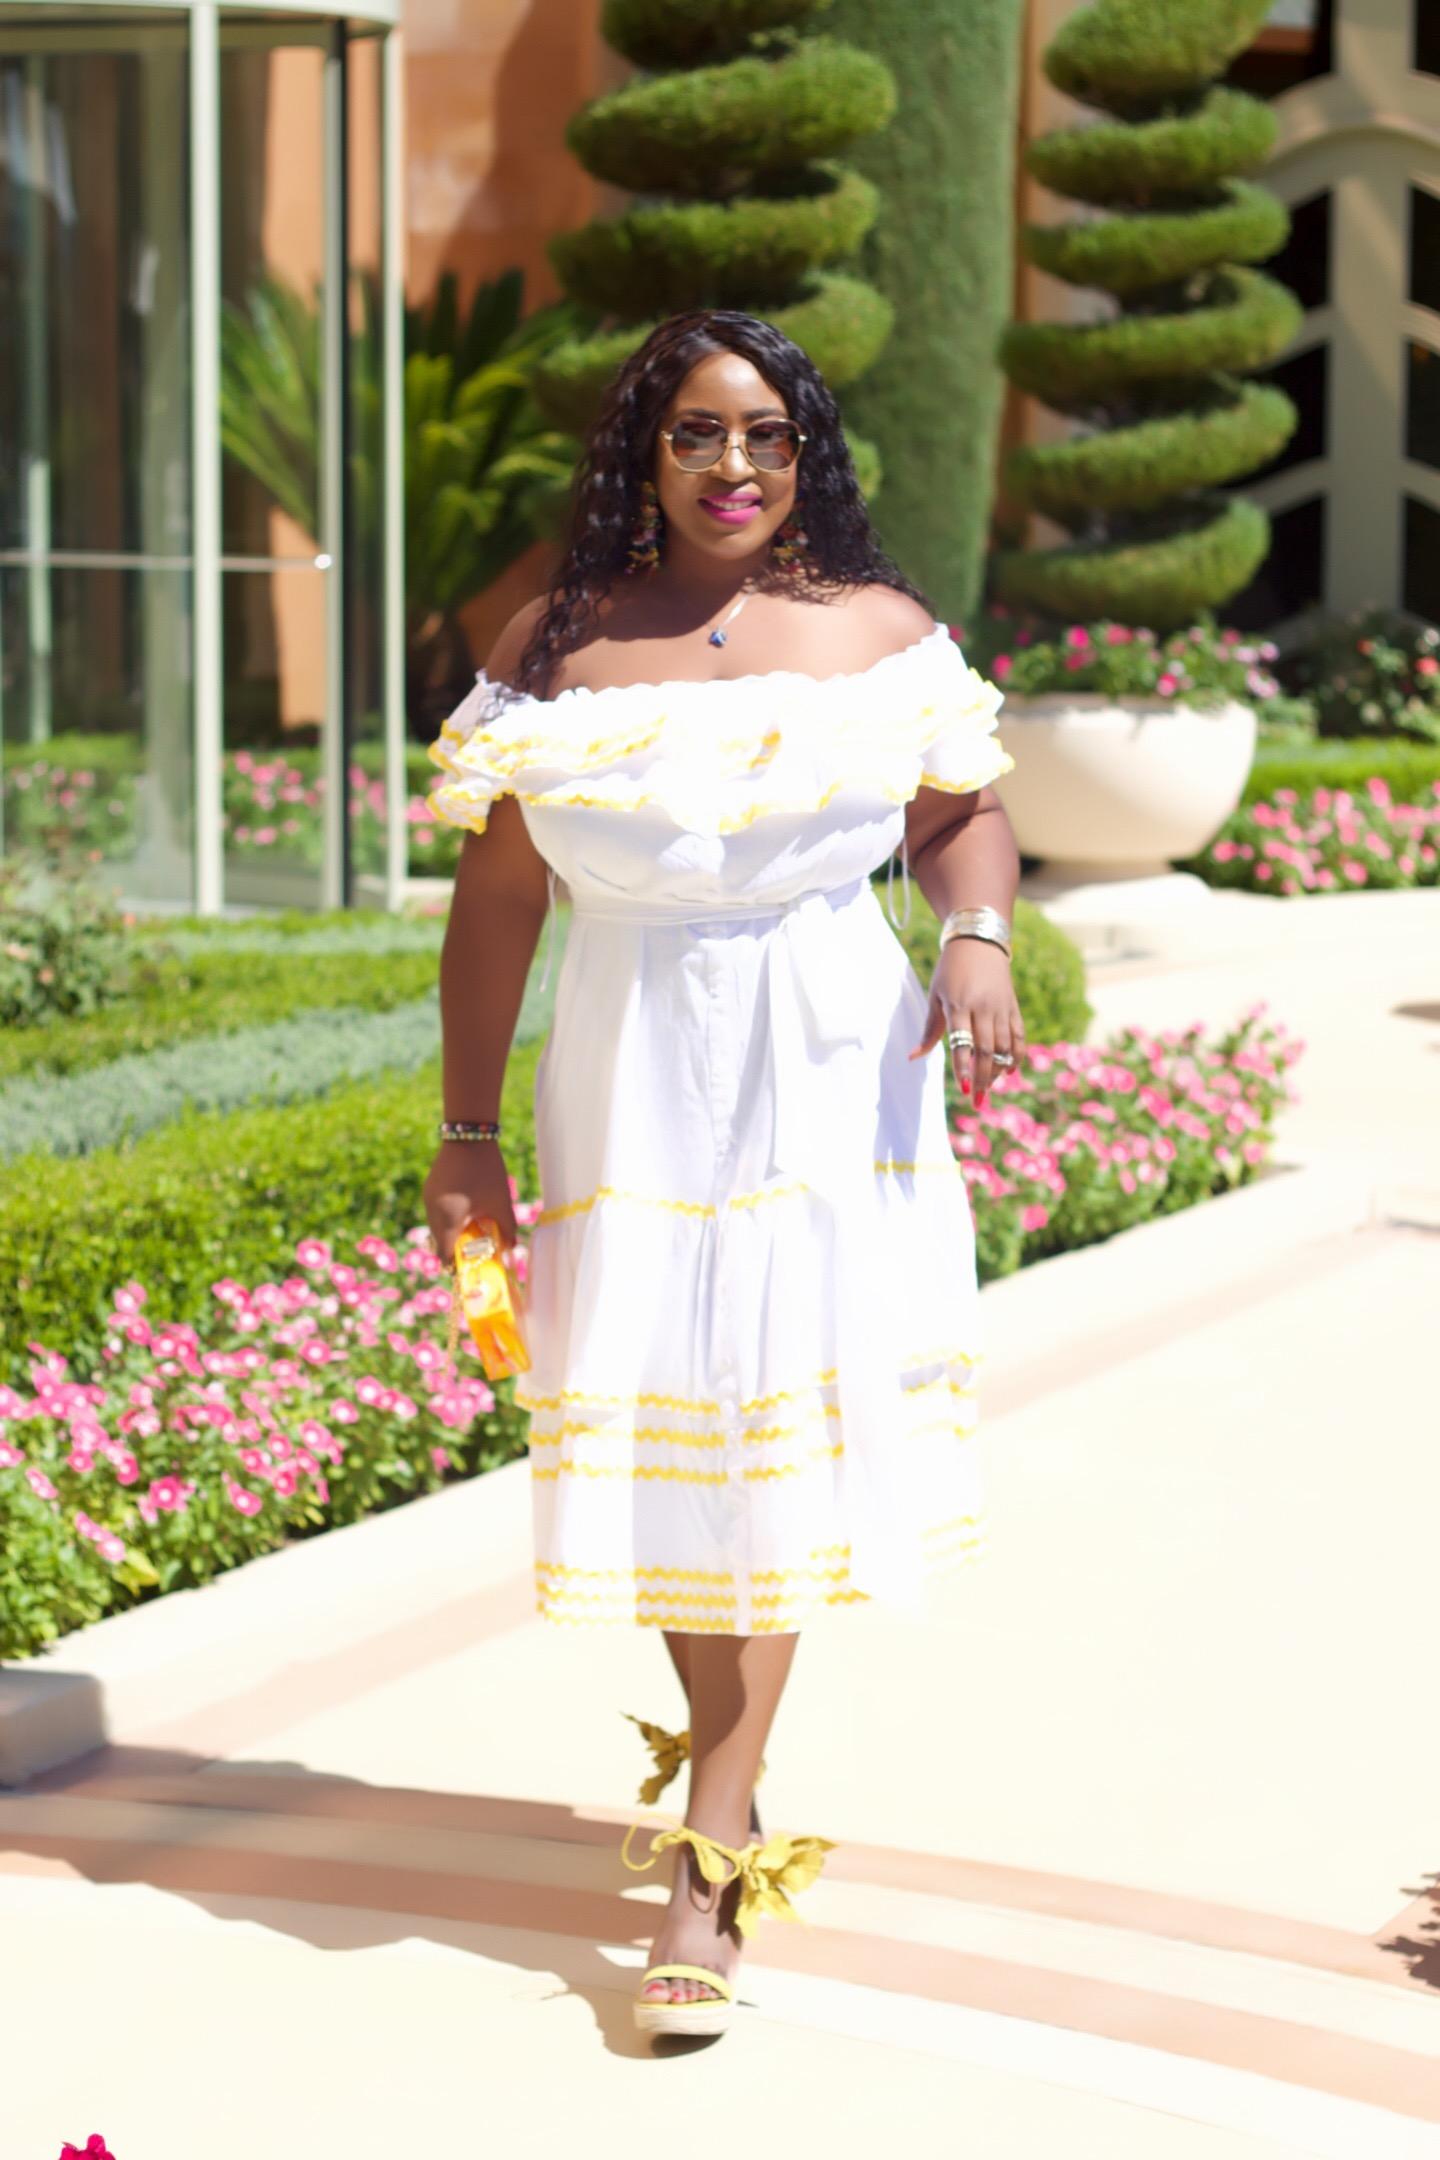 white-off-the-shoulder-dress-fashionista-lifestyle-blog